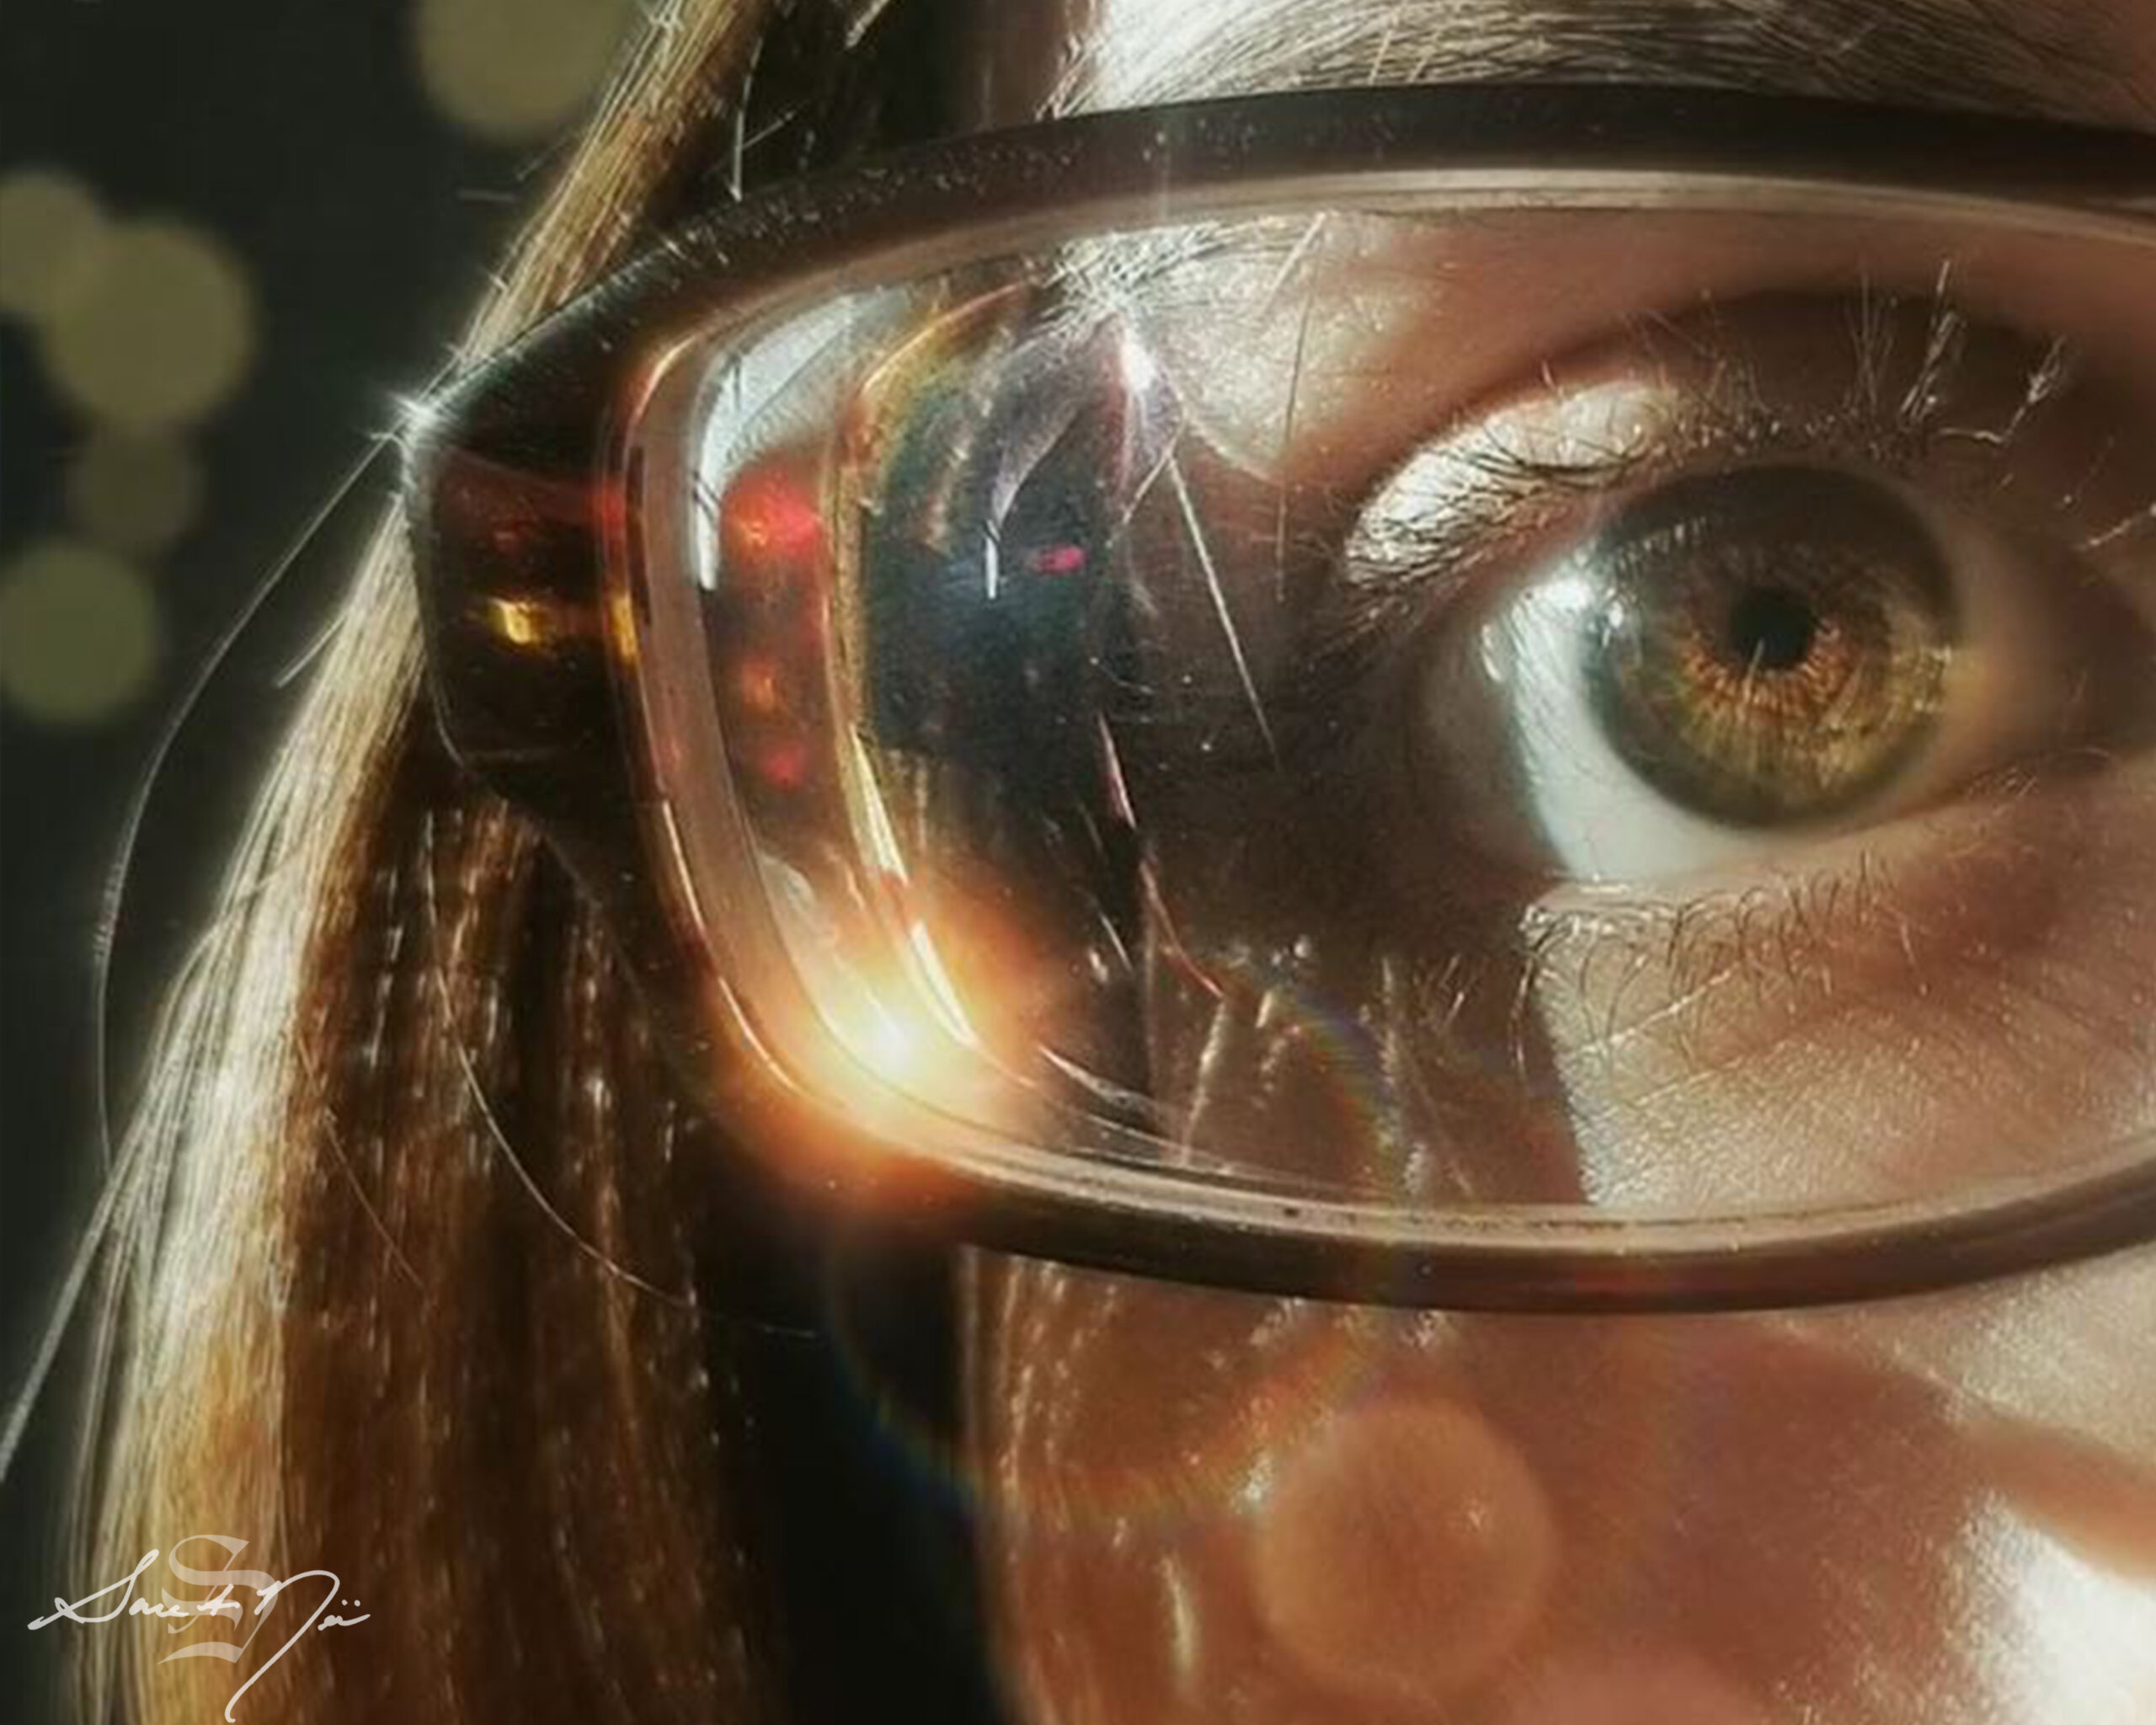 Light shining on glasses hazel brown eye